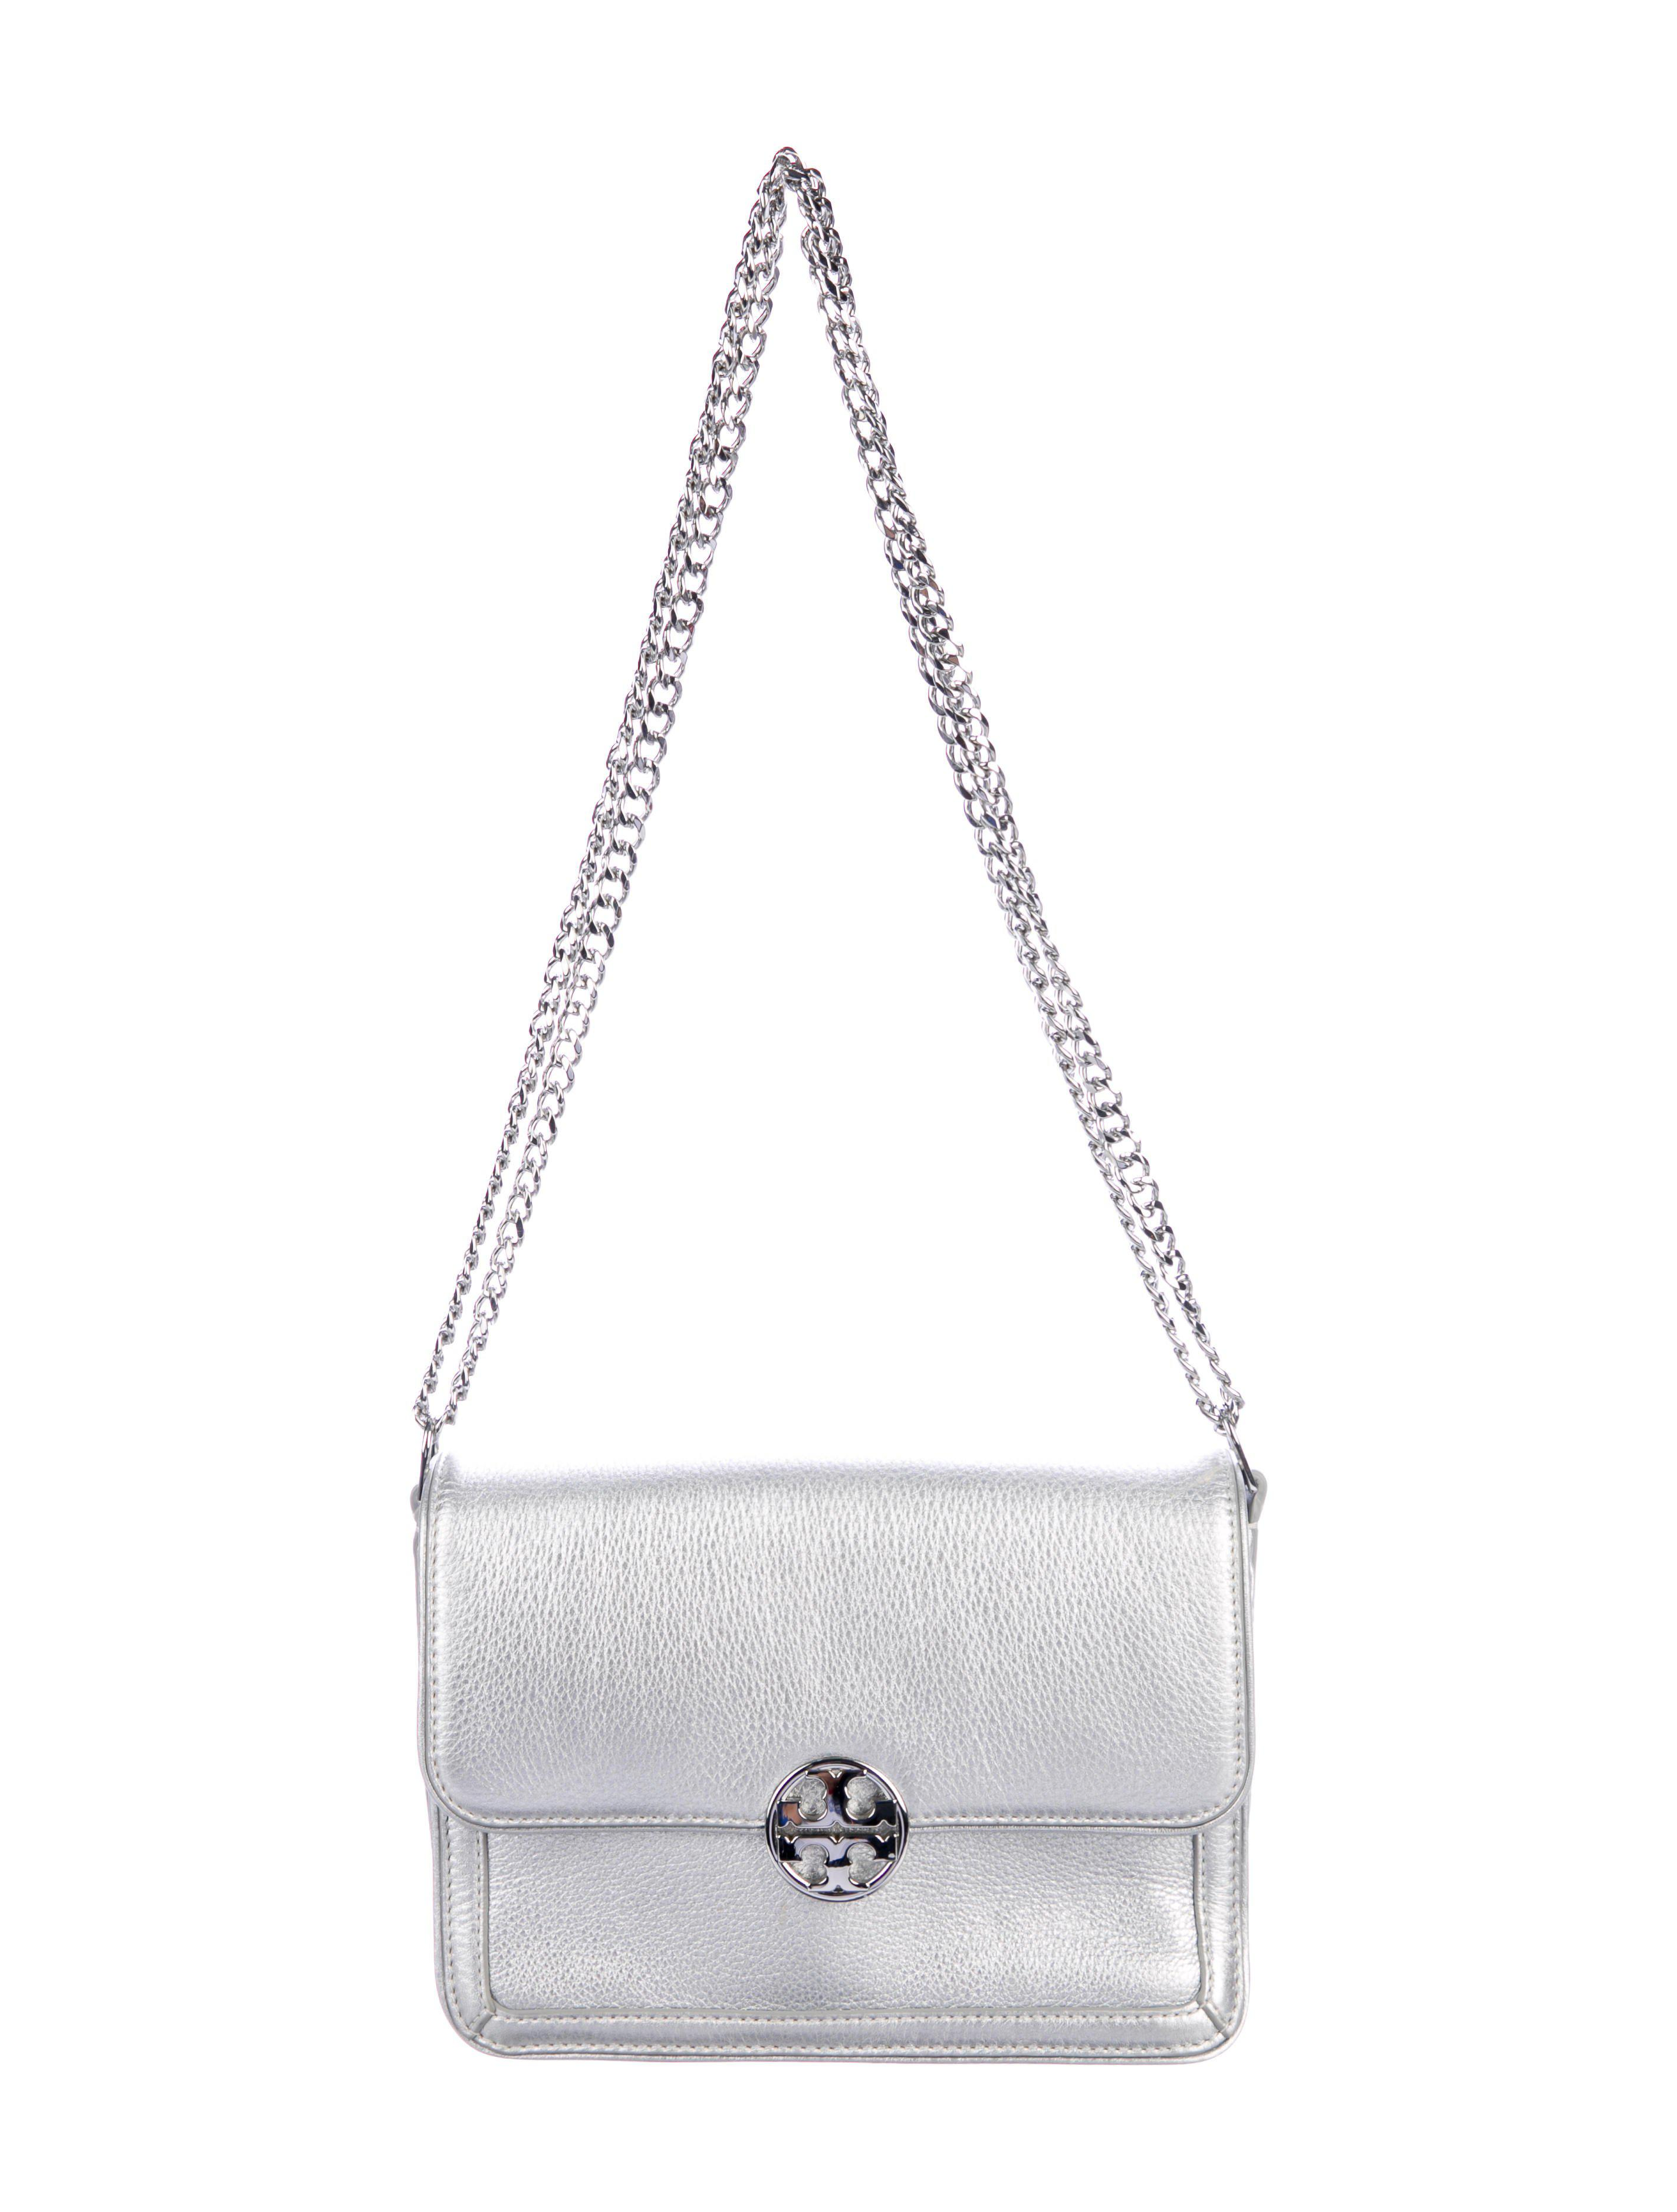 b867a4e41cb Lyst - Tory Burch Duel Chain Convertible Shoulder Bag in Metallic